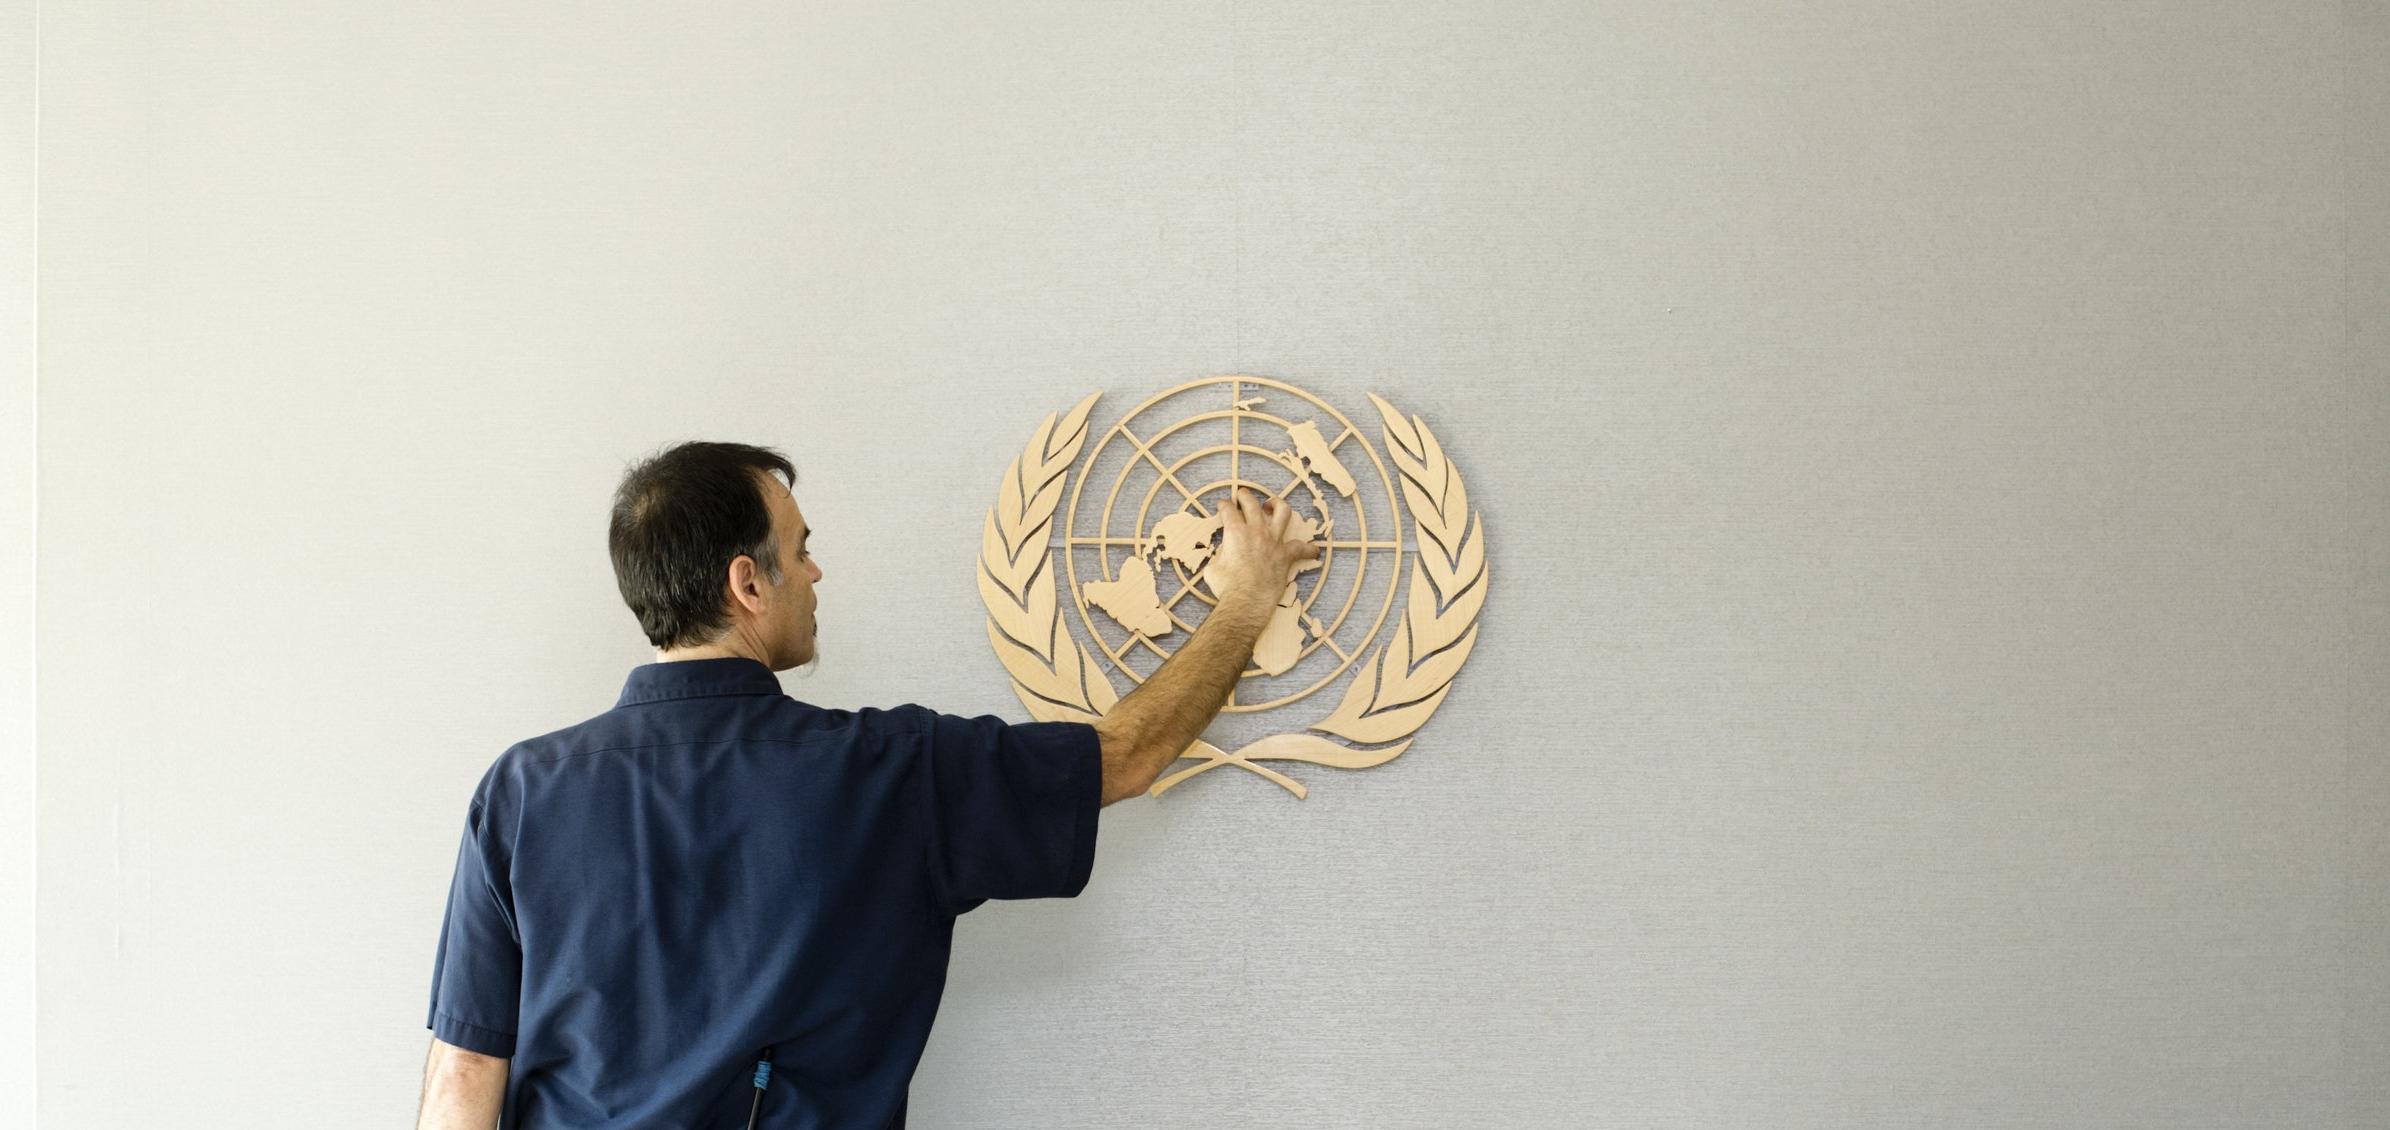 (UN Photo / Mark Garten)